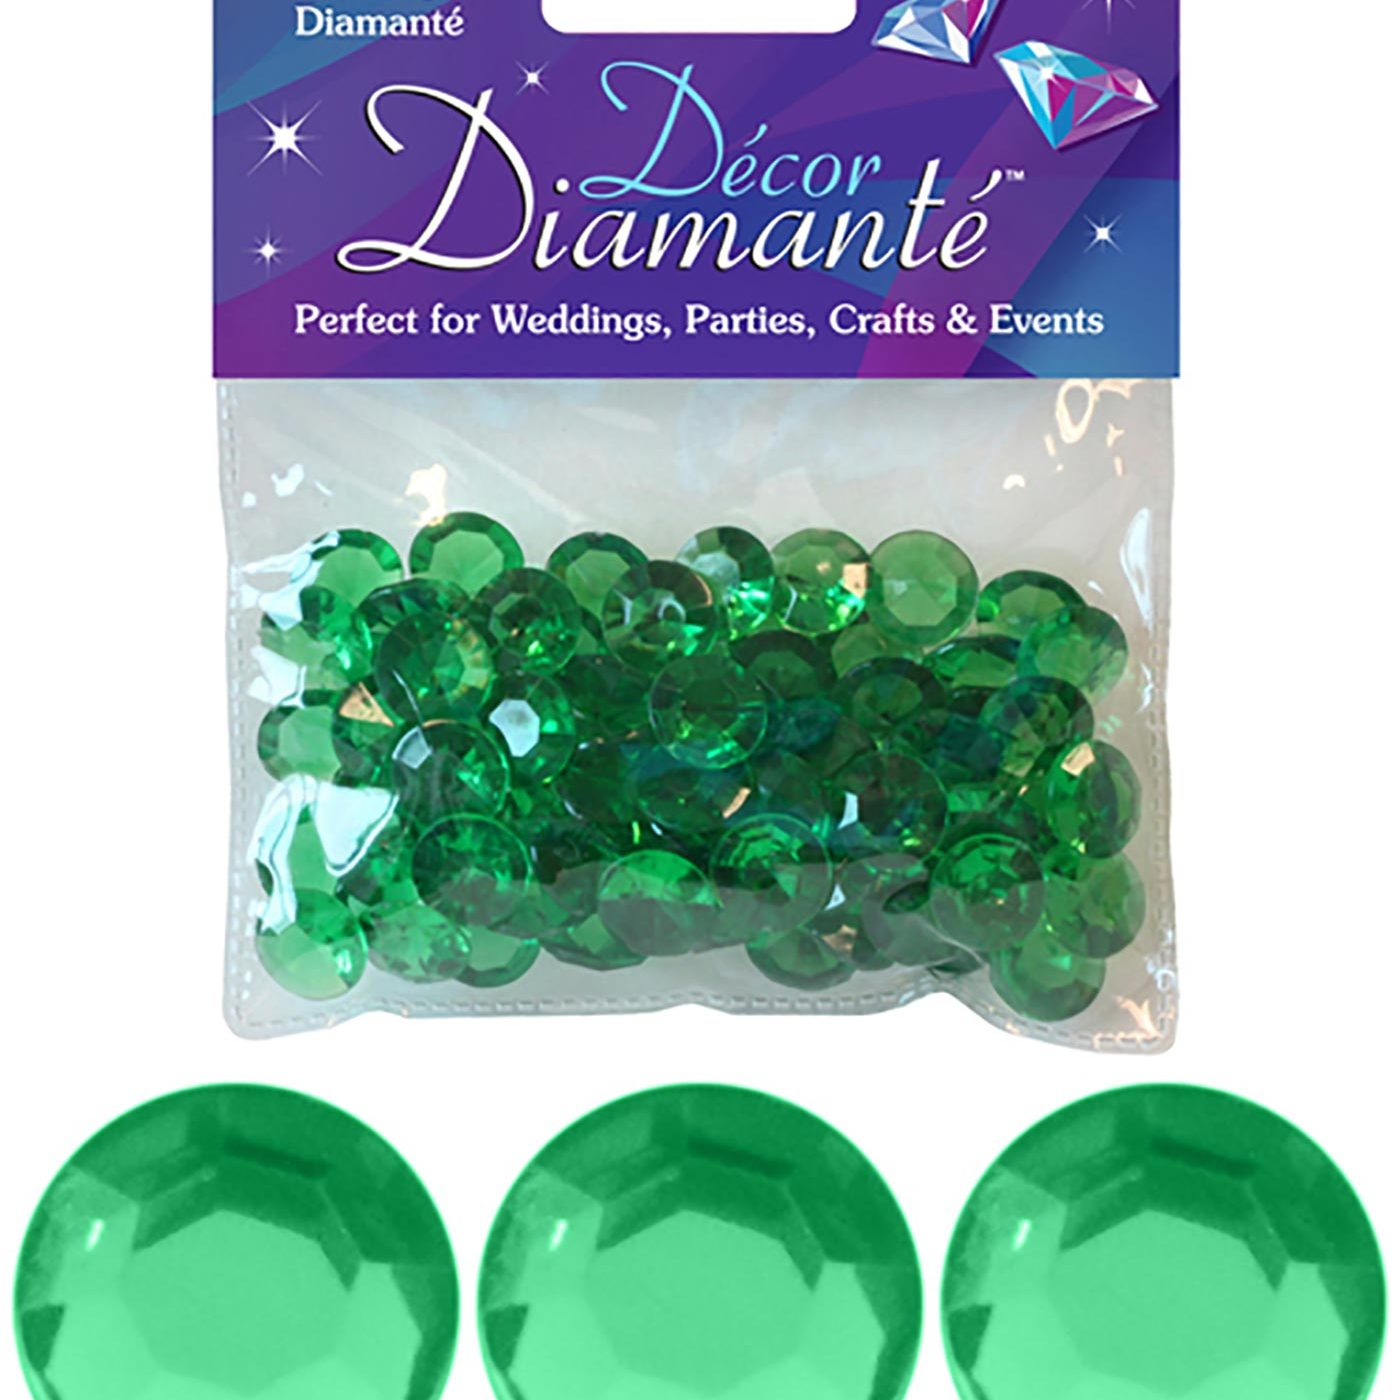 12mm Décor Diamante Diamonds 28g No.15 Emerald